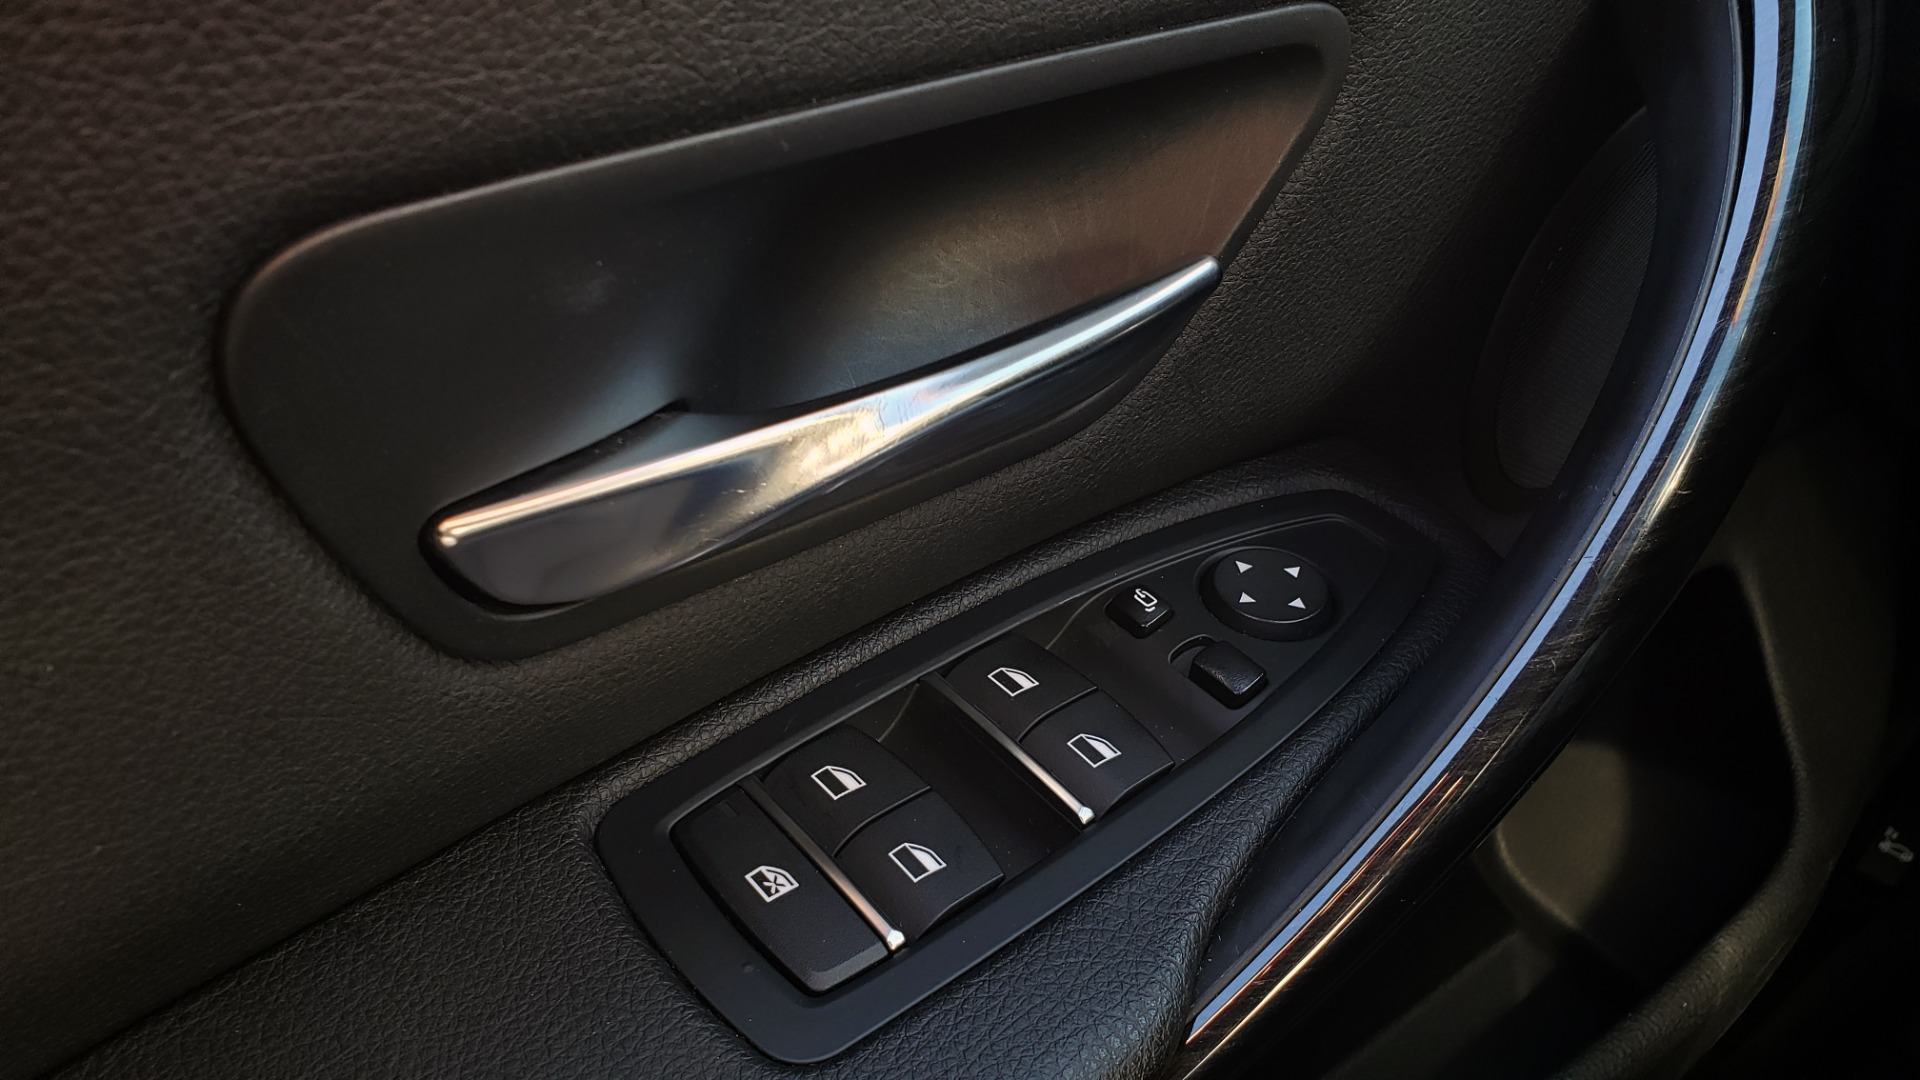 Used 2018 BMW 4 SERIES 430IXDRIVE / PREMIUM / NAV / SUNROOF / ESSENTIALS PKG for sale $27,795 at Formula Imports in Charlotte NC 28227 37